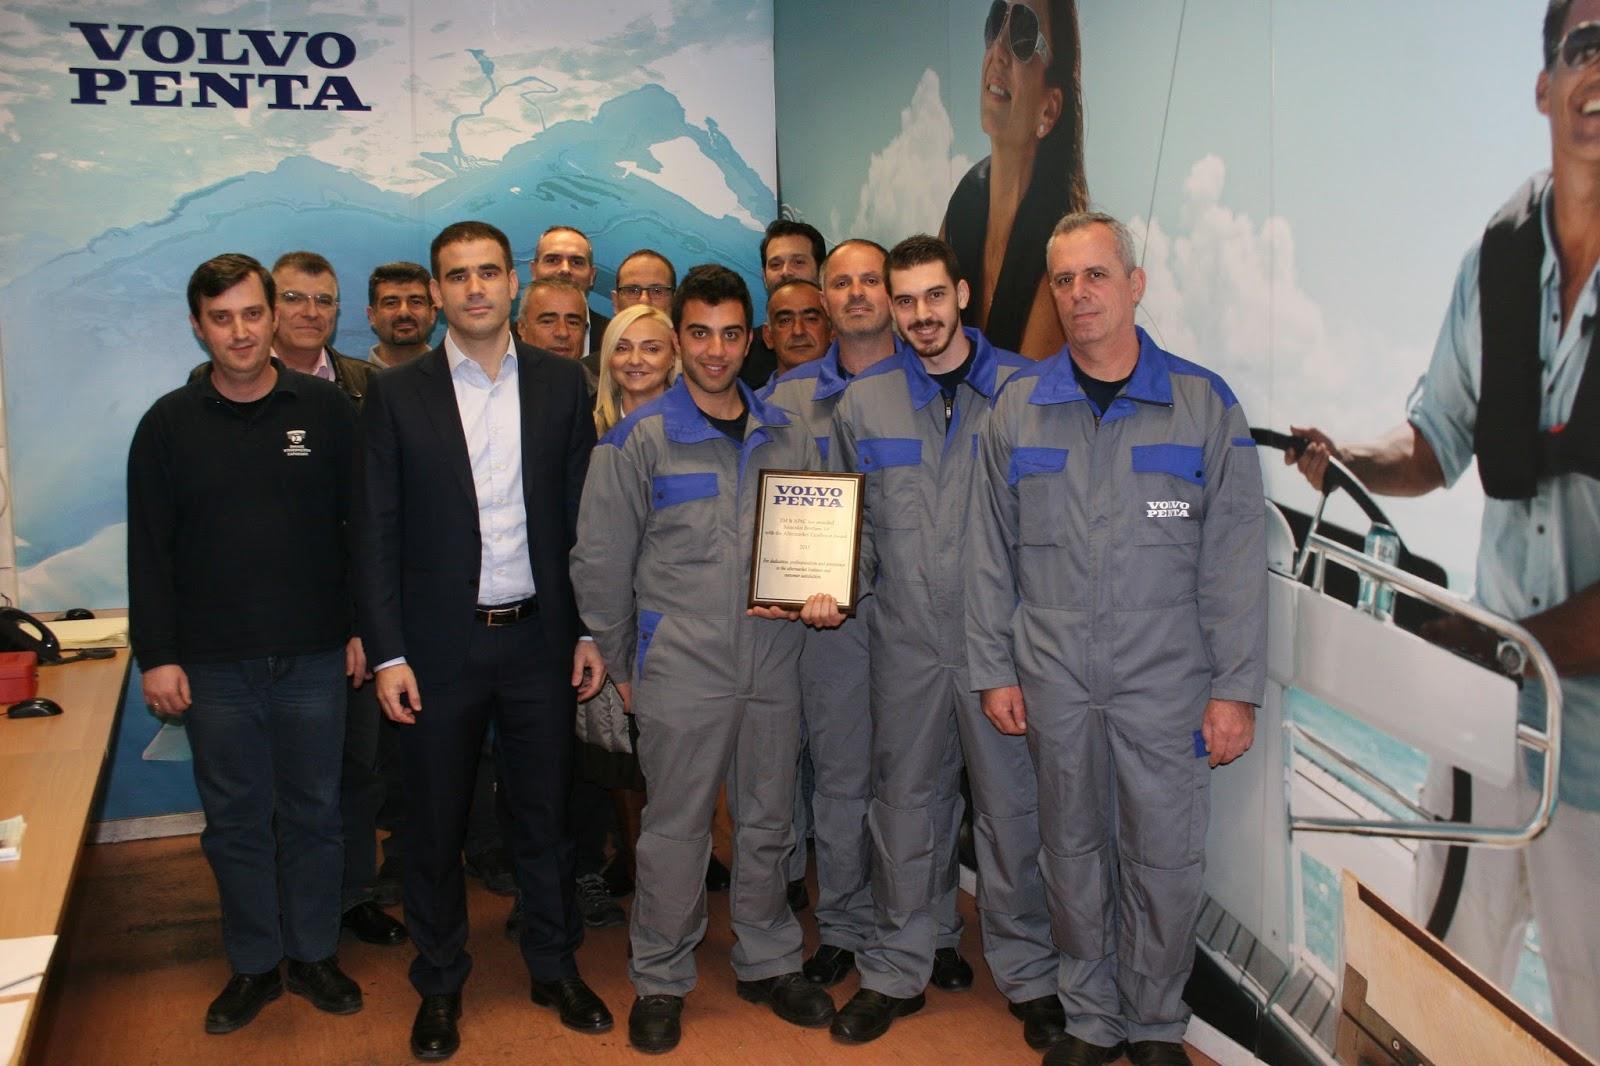 Volvo%2BPenta%2B%25CE%25A3%25CE%25B1%25CF%2581%25CE%25B1%25CE%25BA%25CE%25B1%25CE%25BA%25CE%25B7%25CF%2582%2BAfter%2BSales%2BAward Πρώτη θέση στην παροχή υπηρεσιών After-Sales για τη Volvo Penta Σαρακάκης ανάμεσα σε 42 χώρες από 4 ηπείρους